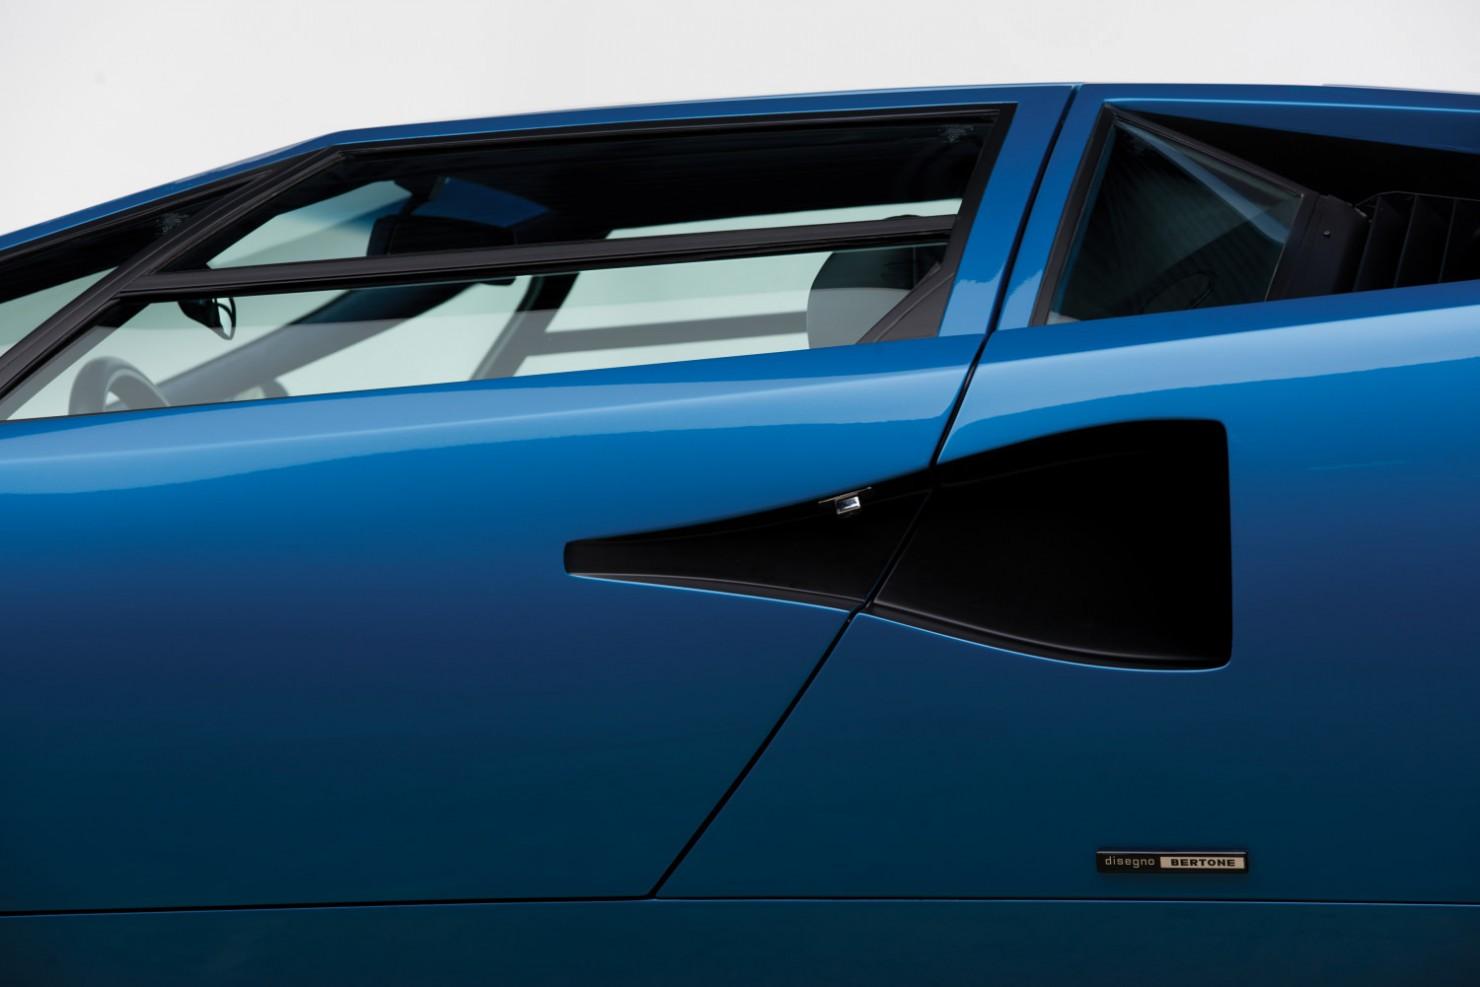 Lamborghini-Countach-LP400S-17